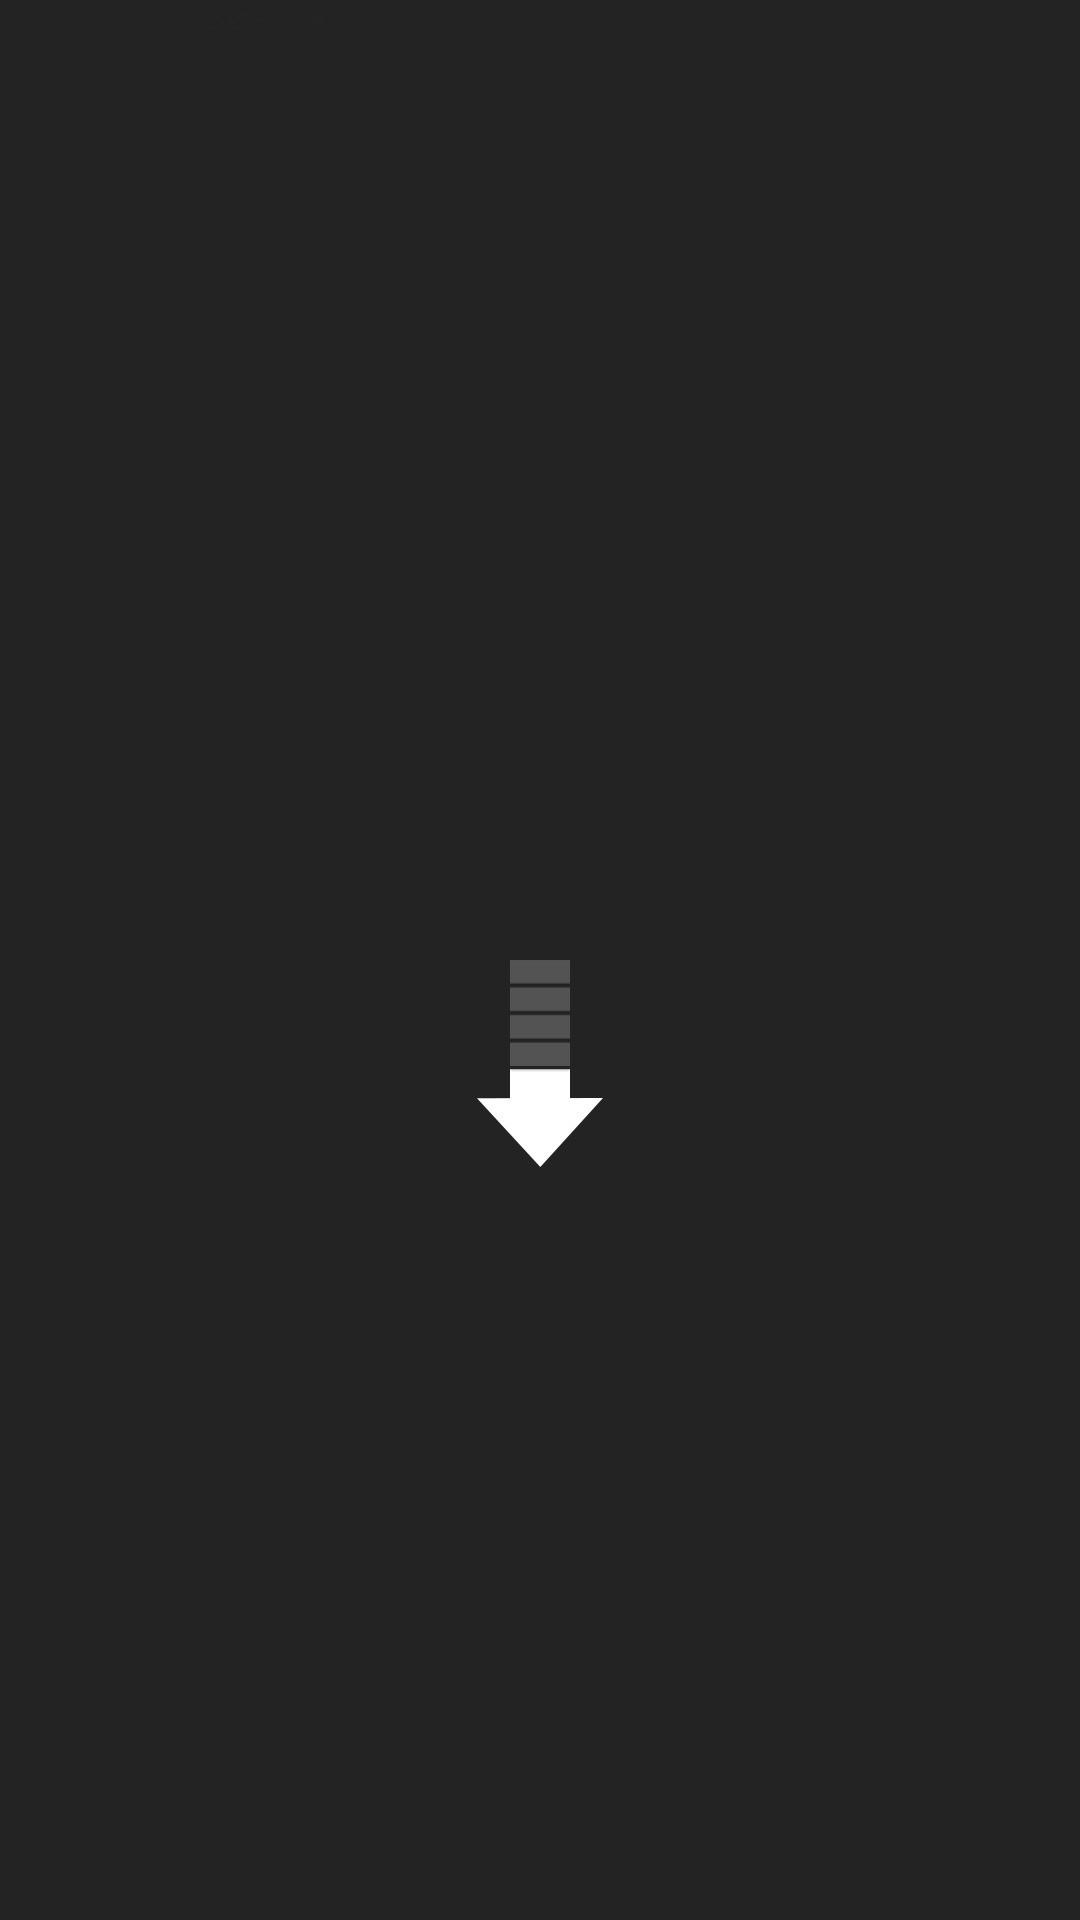 … Arrow Minimalistic mobile wallpaper